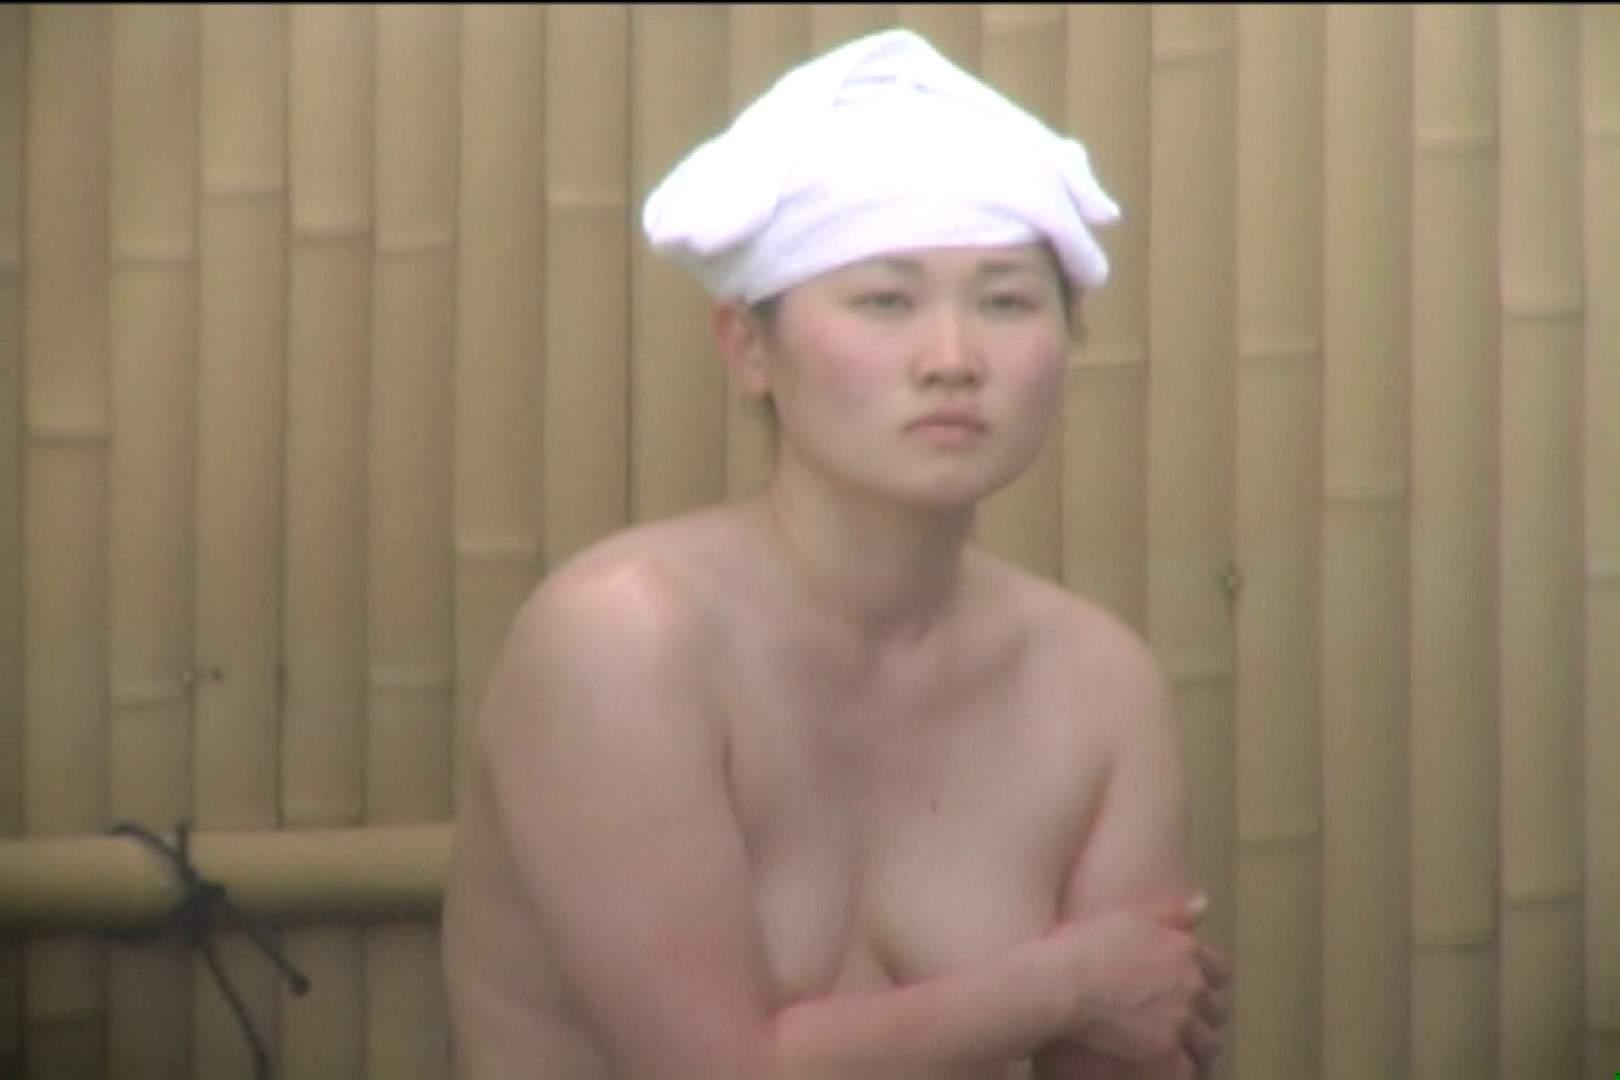 高画質露天女風呂観察 vol.015 高画質 えろ無修正画像 10枚 9